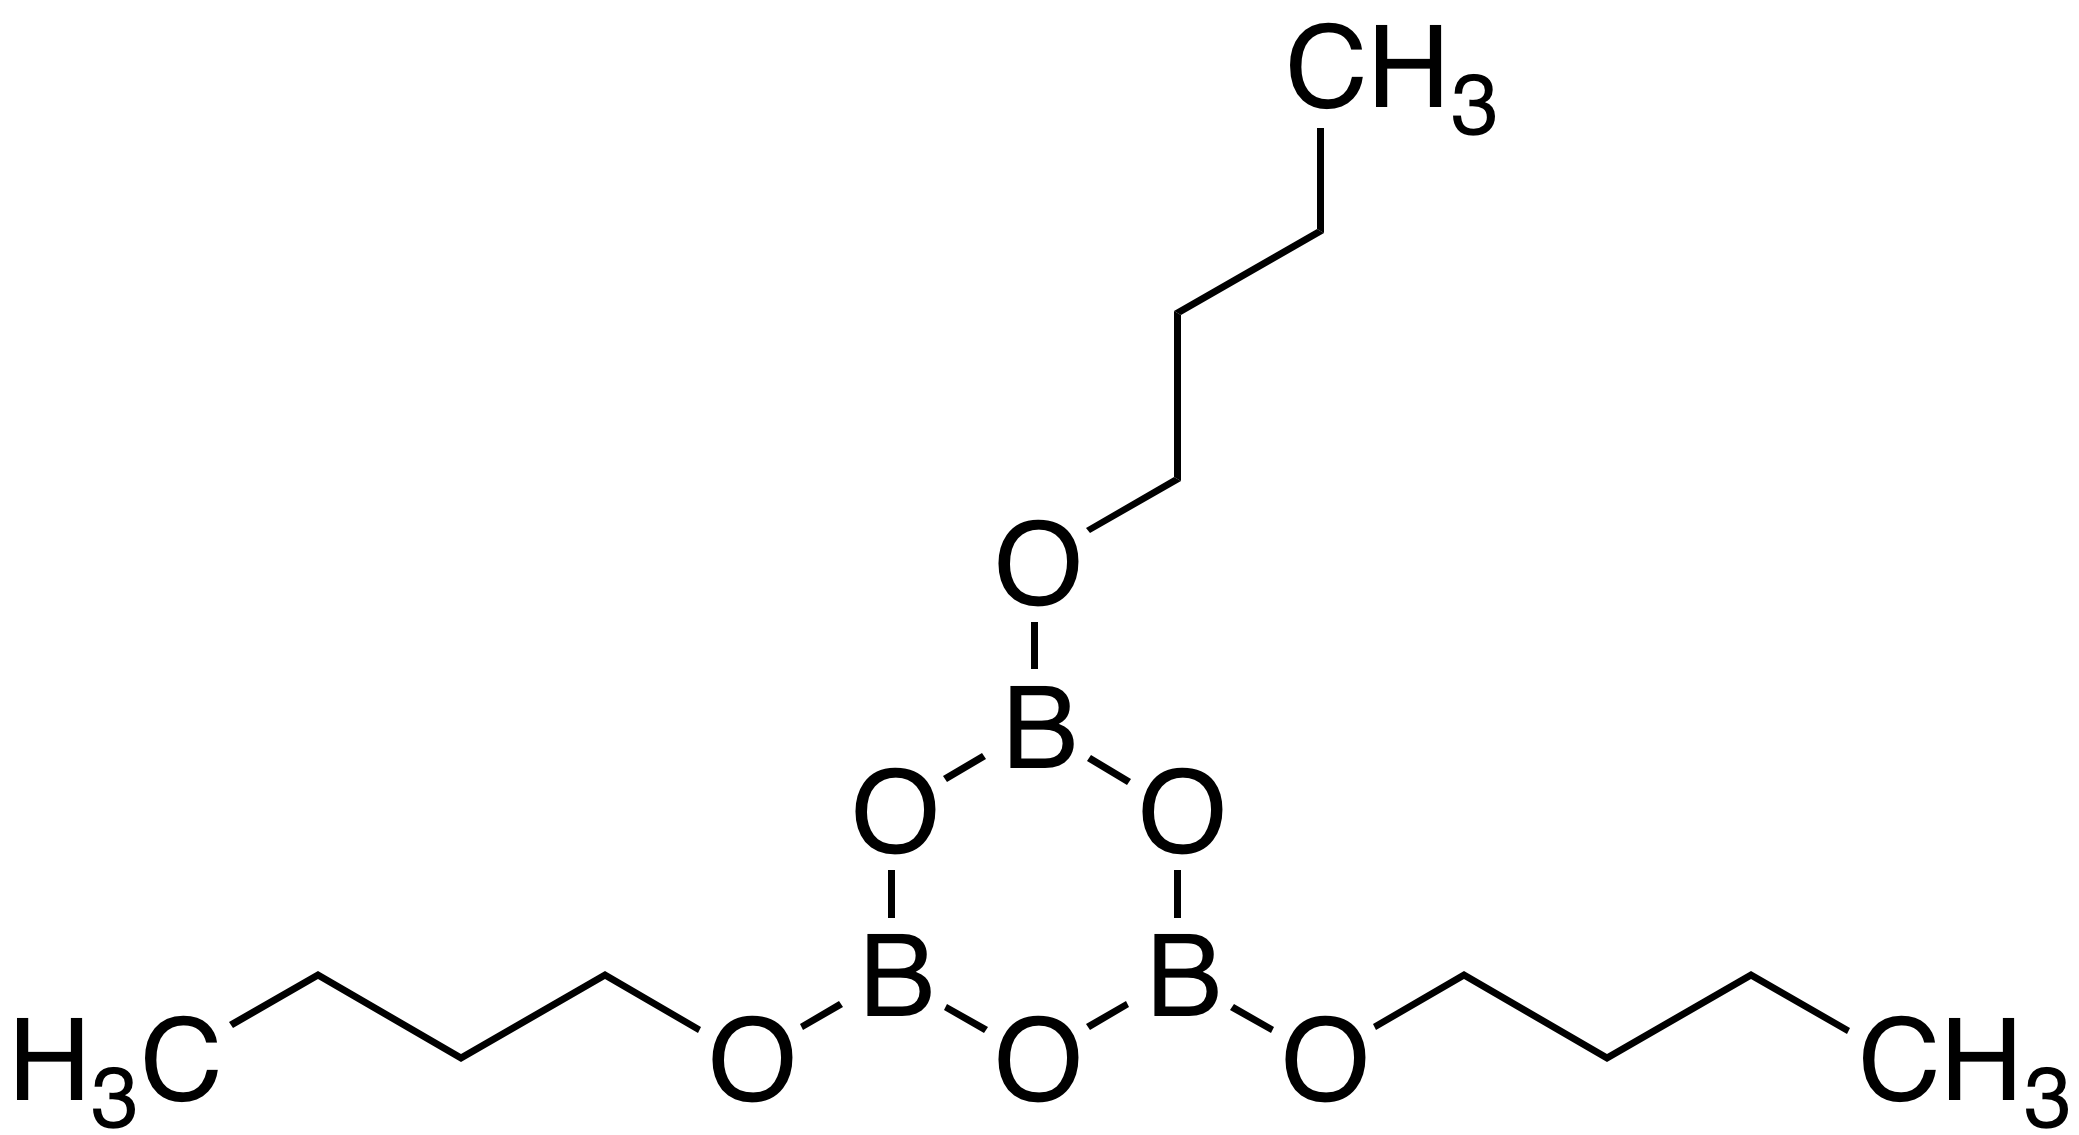 2,4,6-Tributoxyboroxin